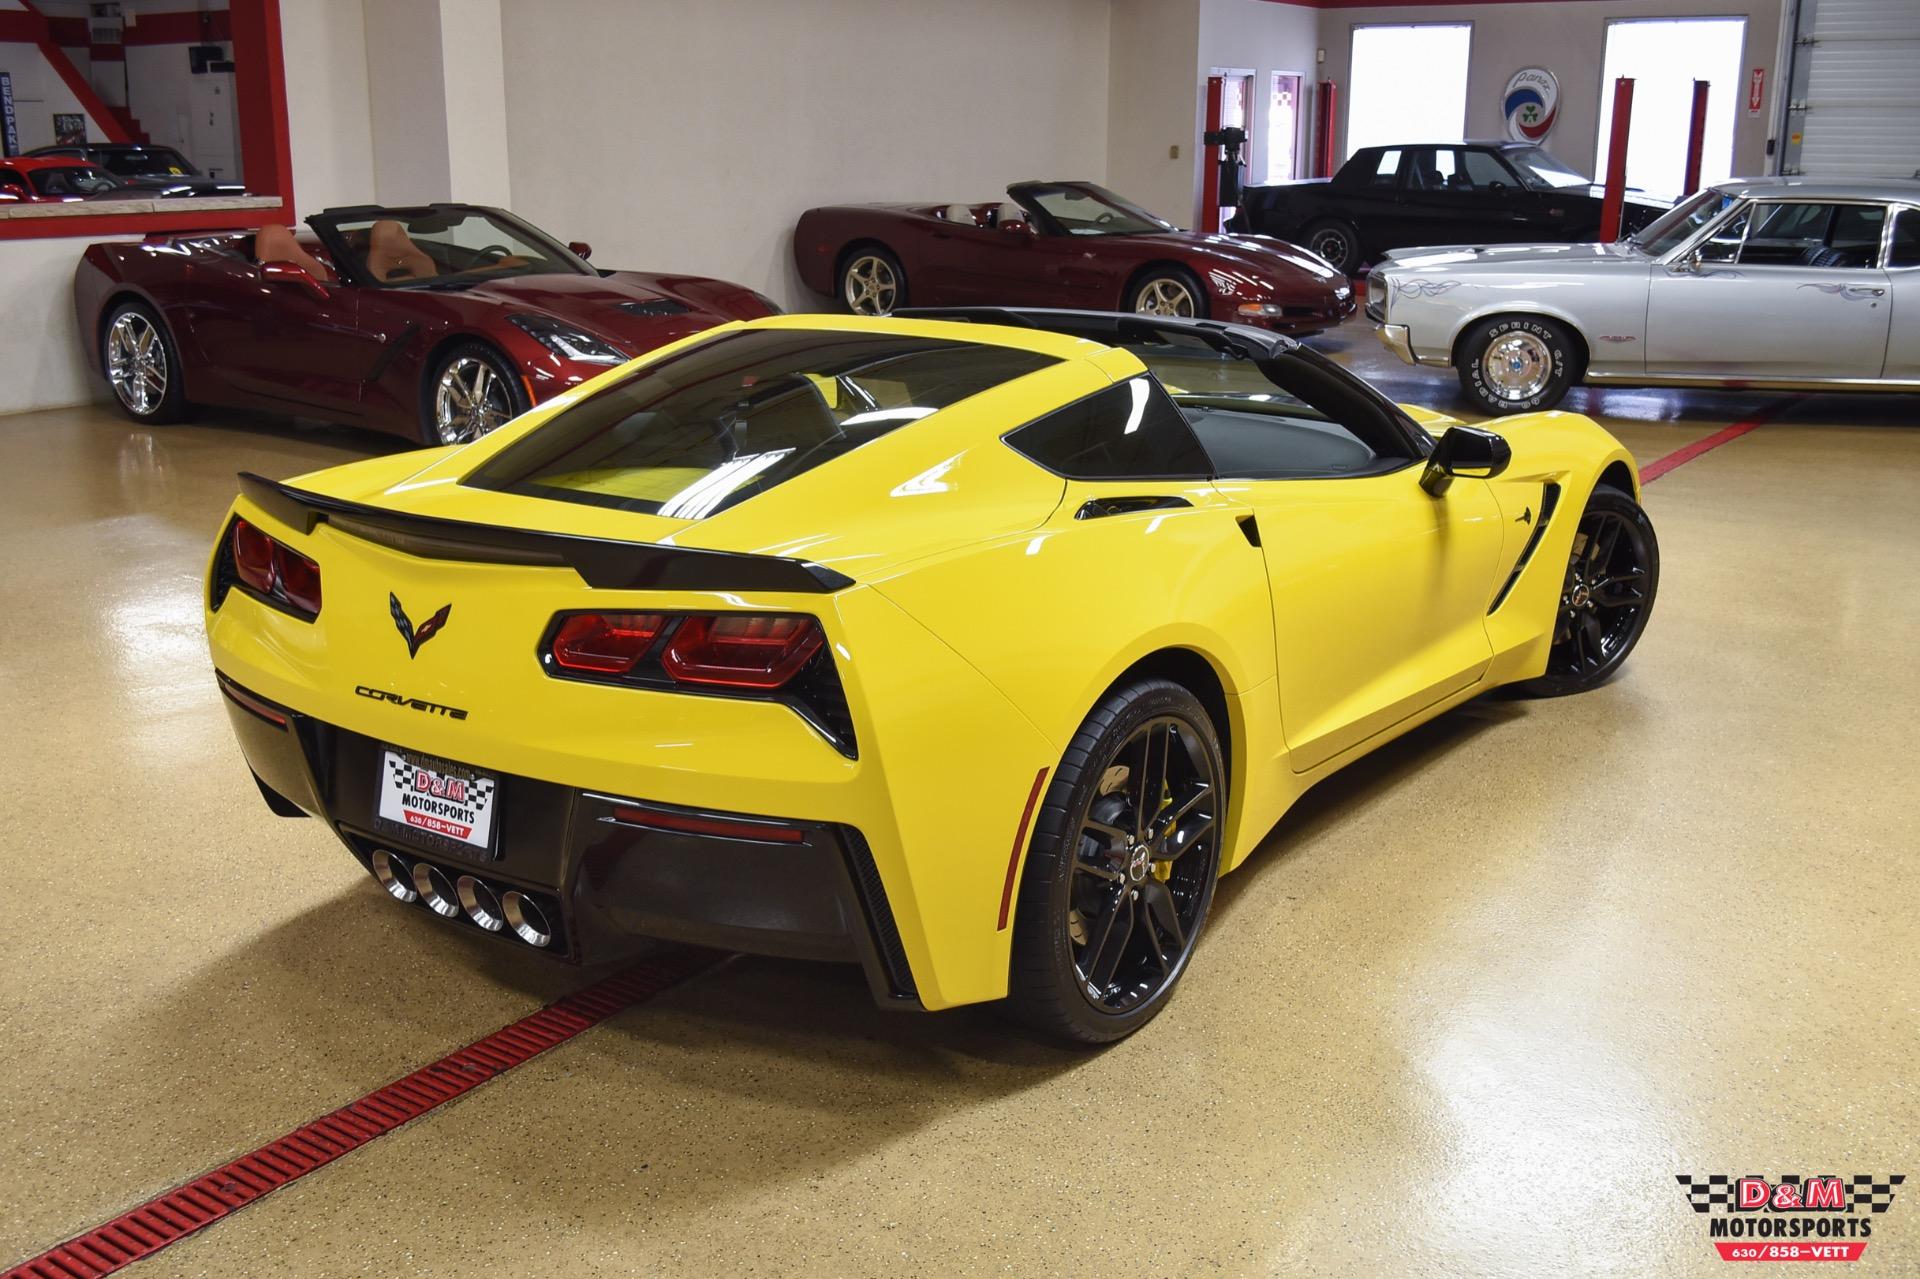 Used 2015 Chevrolet Corvette Stingray Coupe W/Z51 | Glen Ellyn, IL